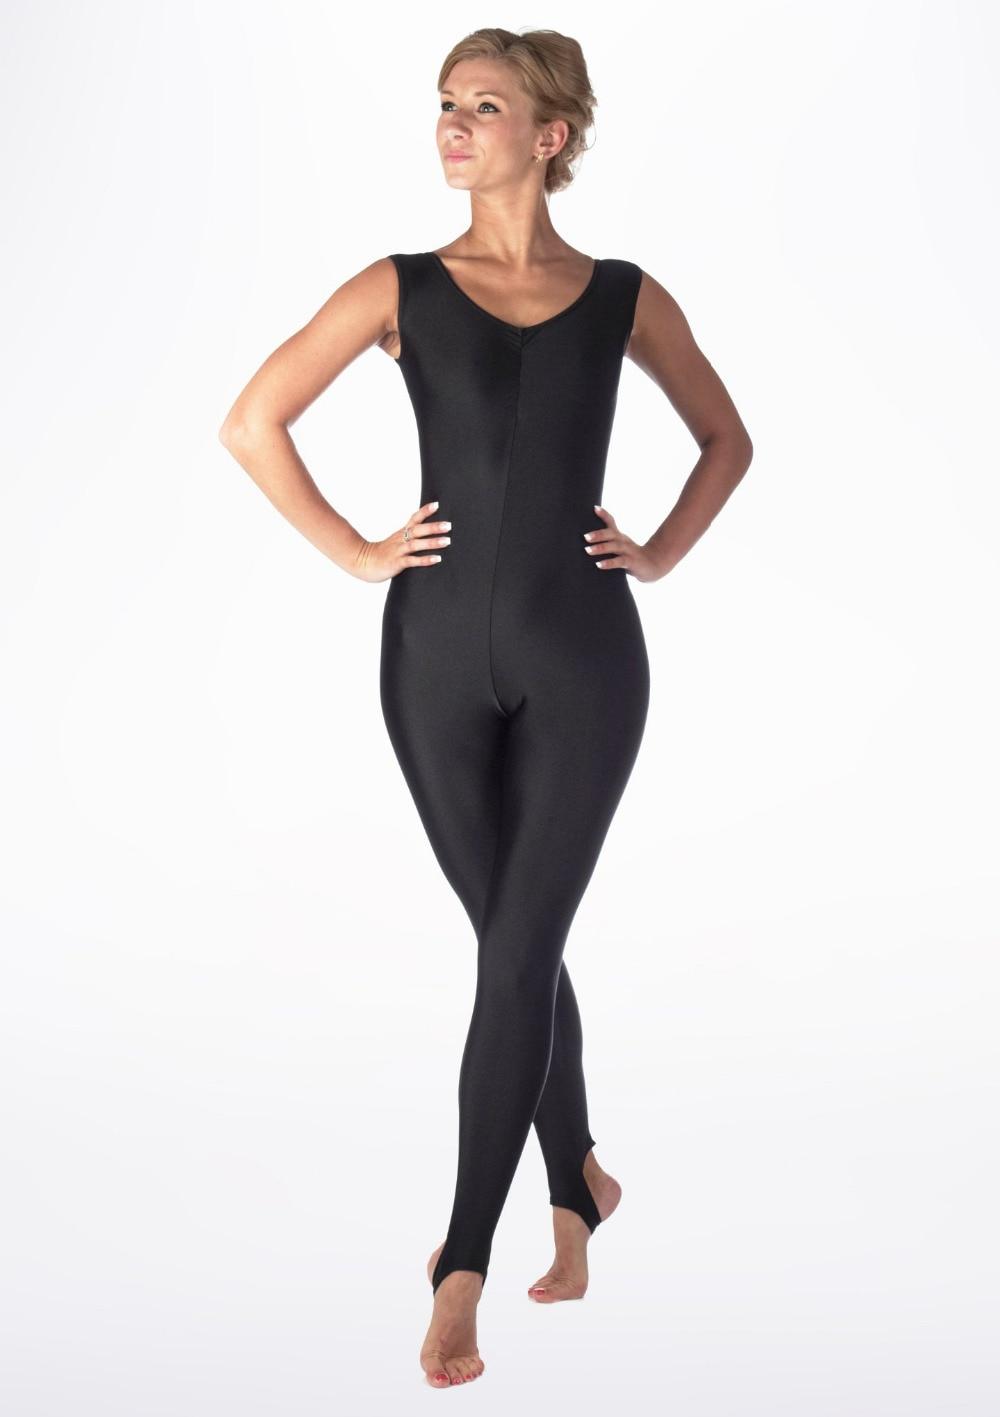 Strapless sexy black batgirl boob galery dress